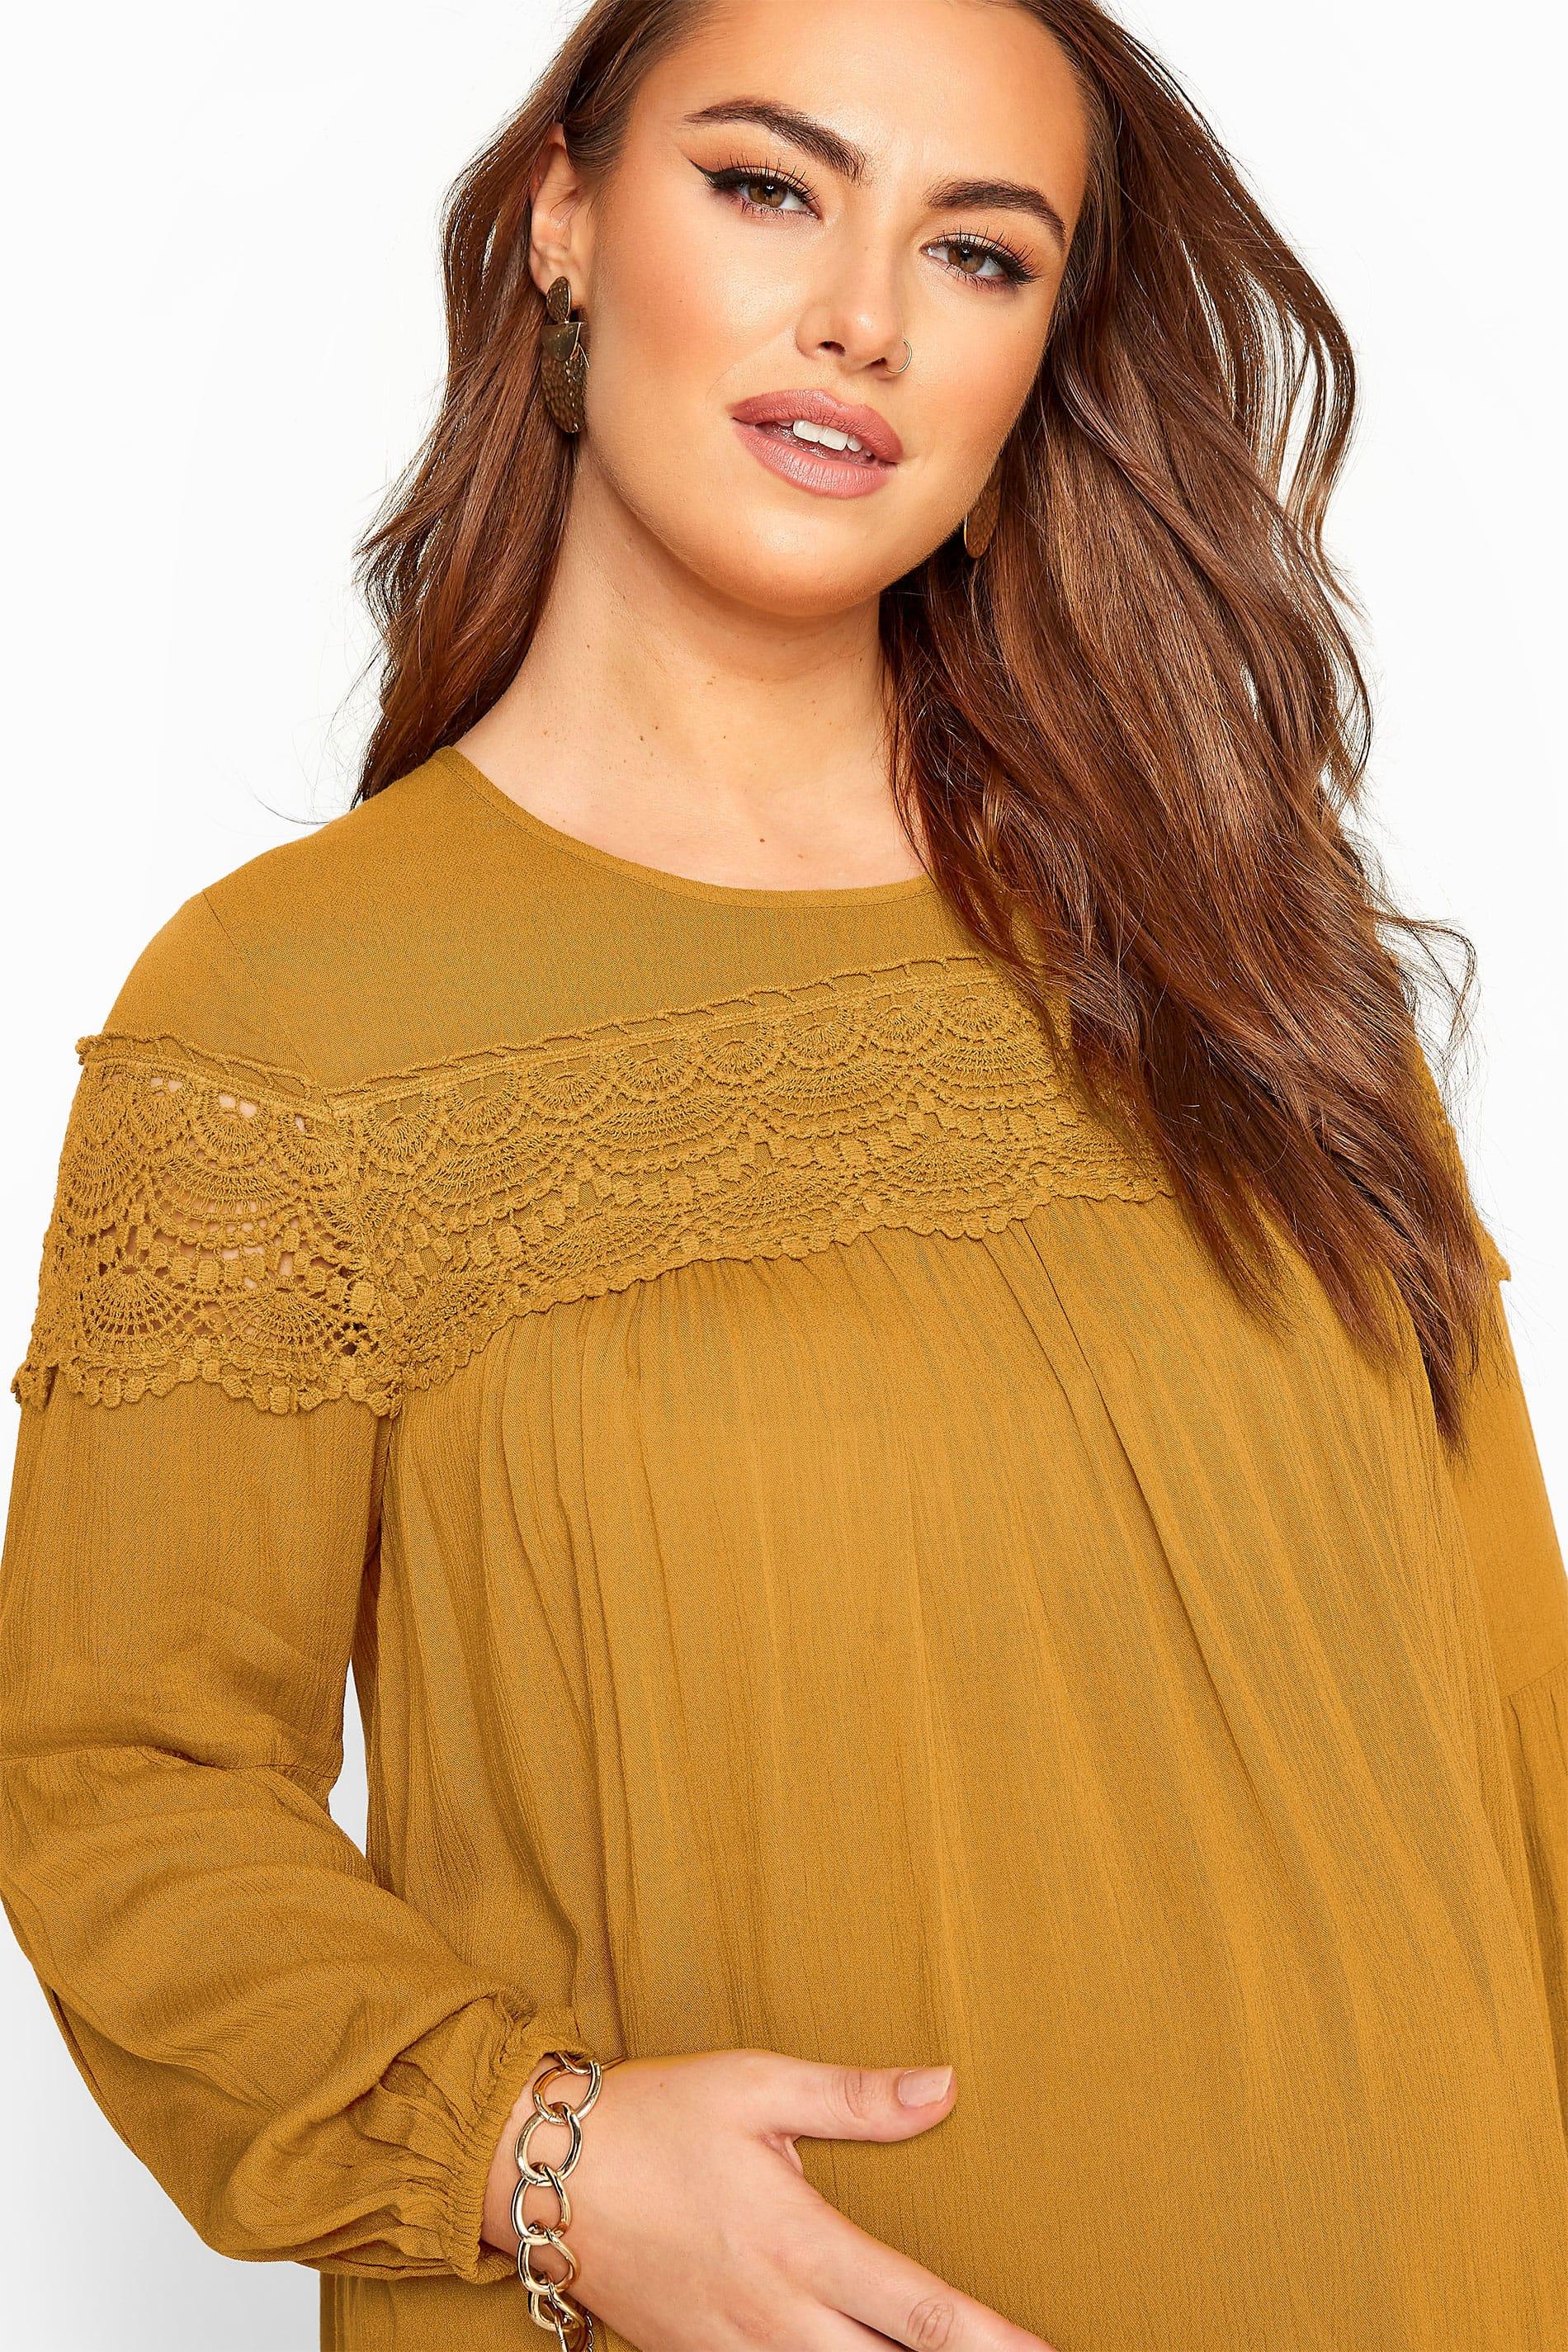 BUMP IT UP MATERNITY Mustard Yellow Lace Insert Top